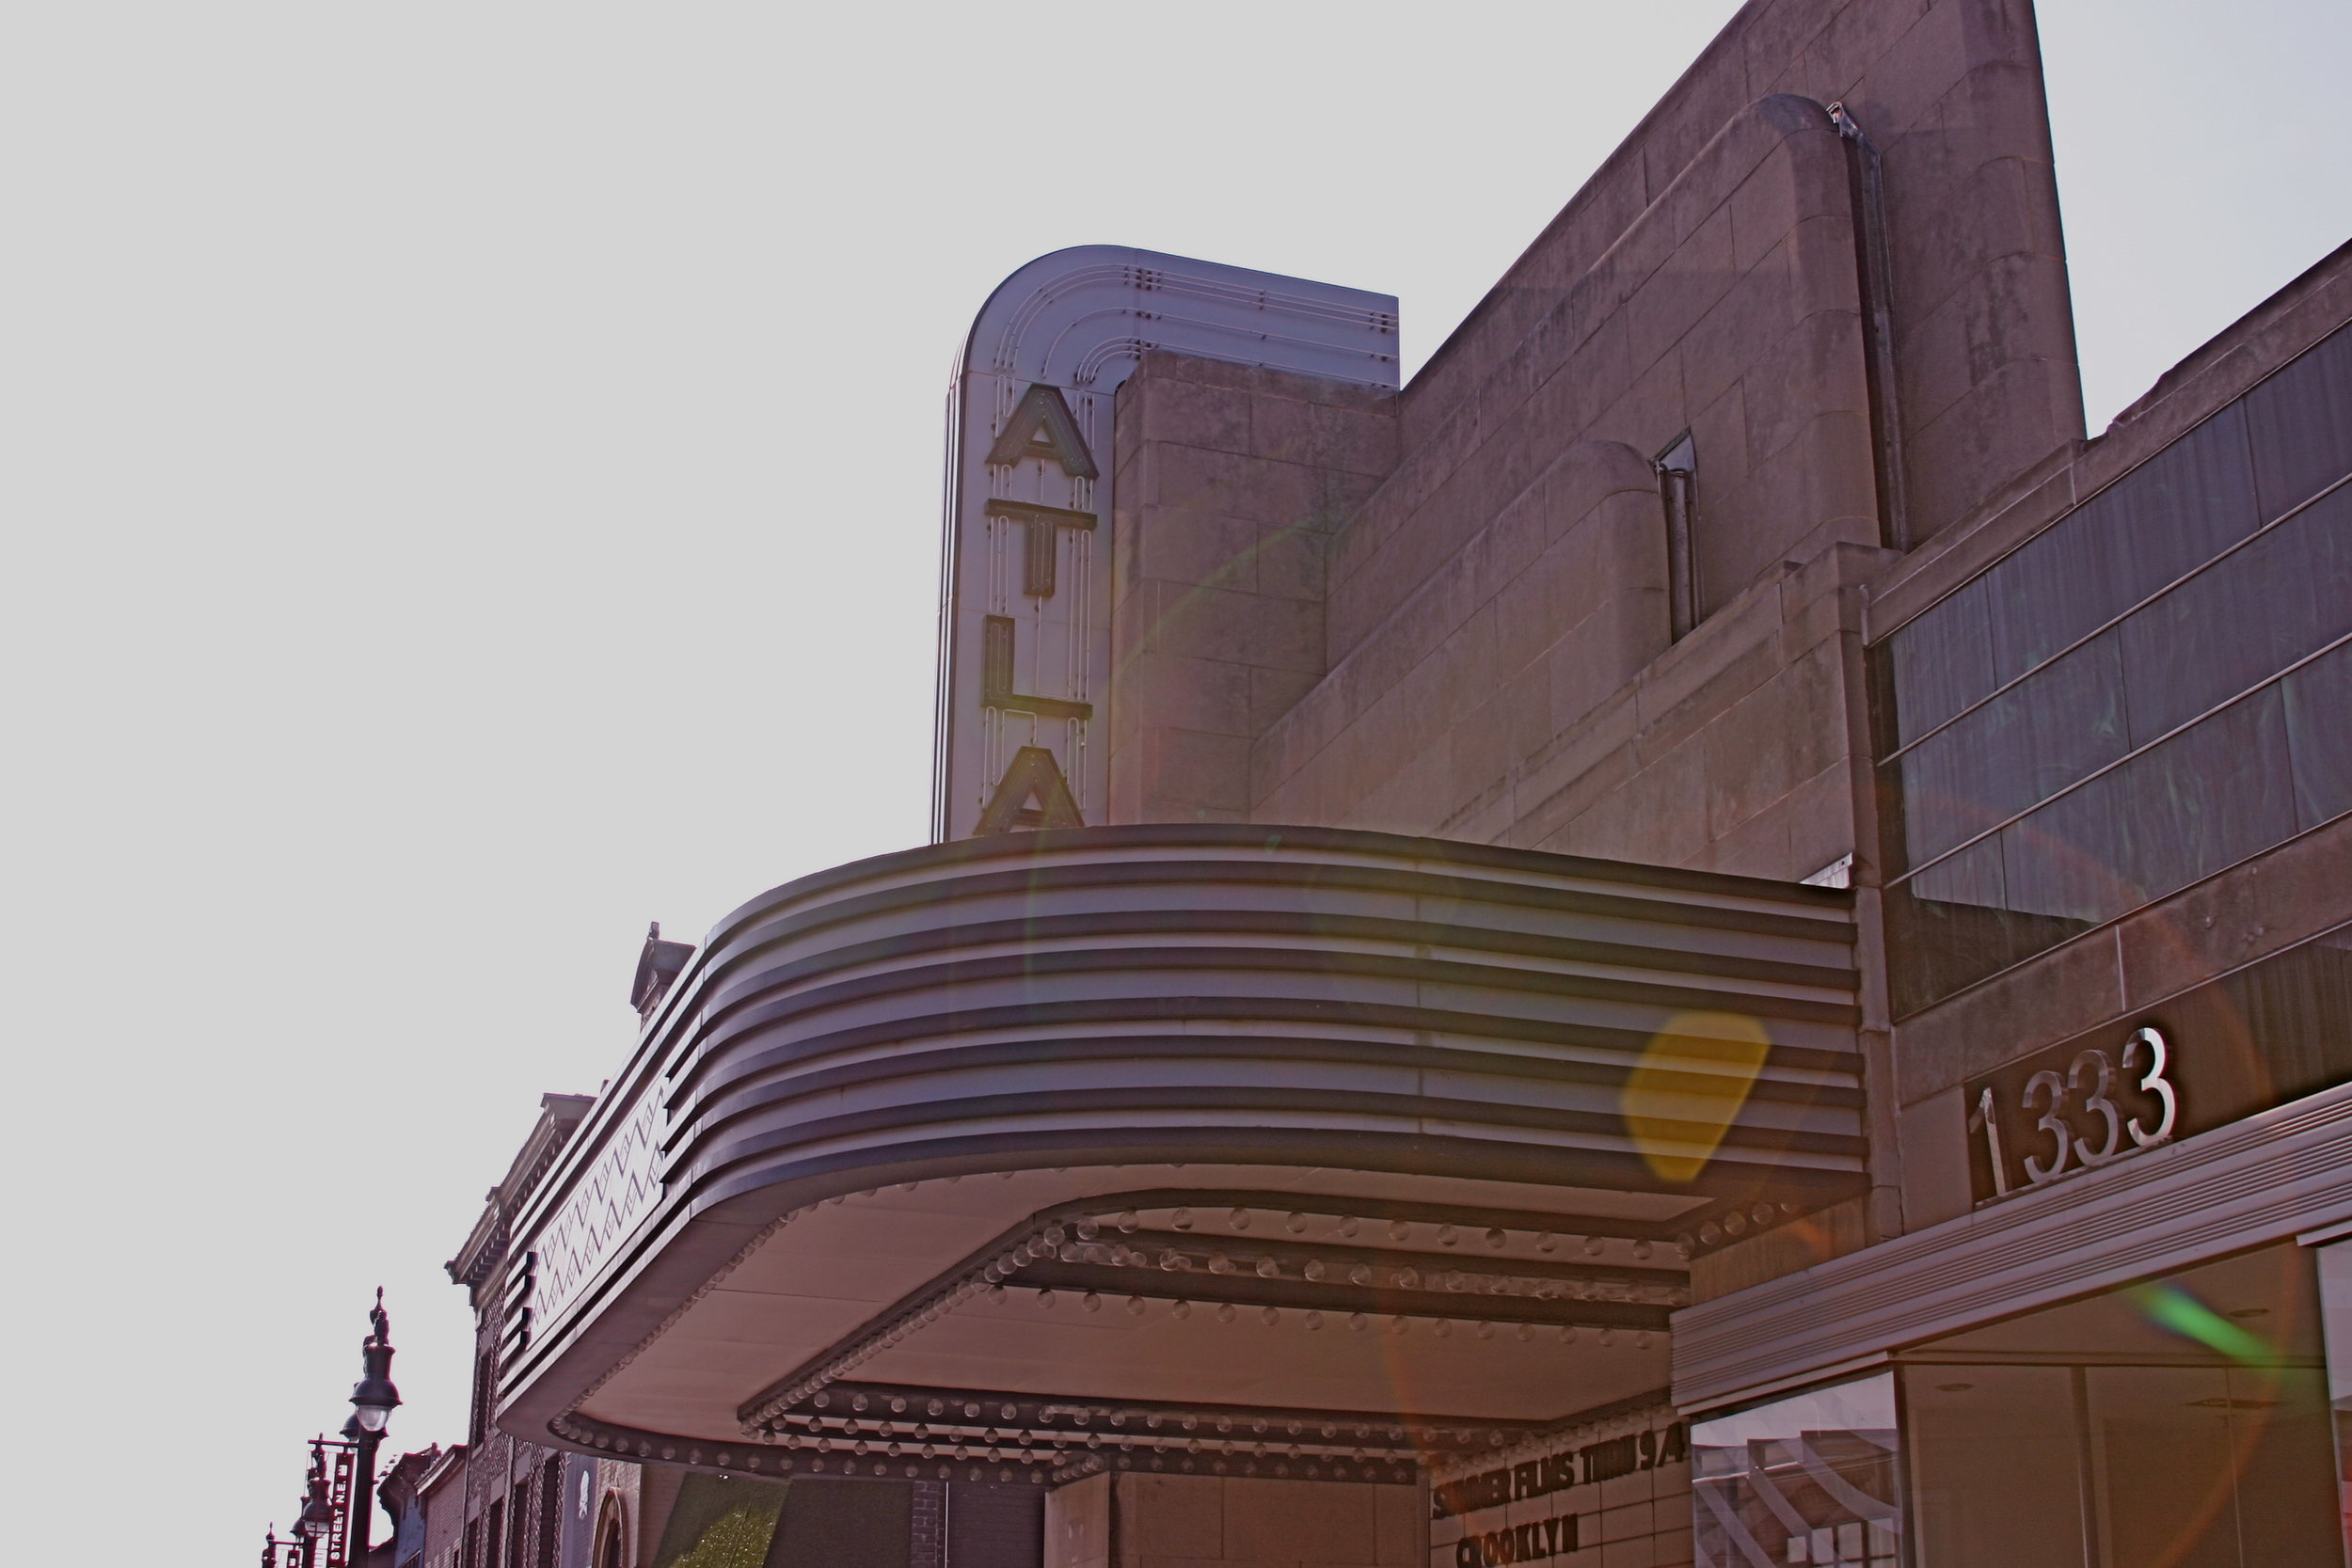 Atlas Theater, H Street NE, Washington, DC, July 2011